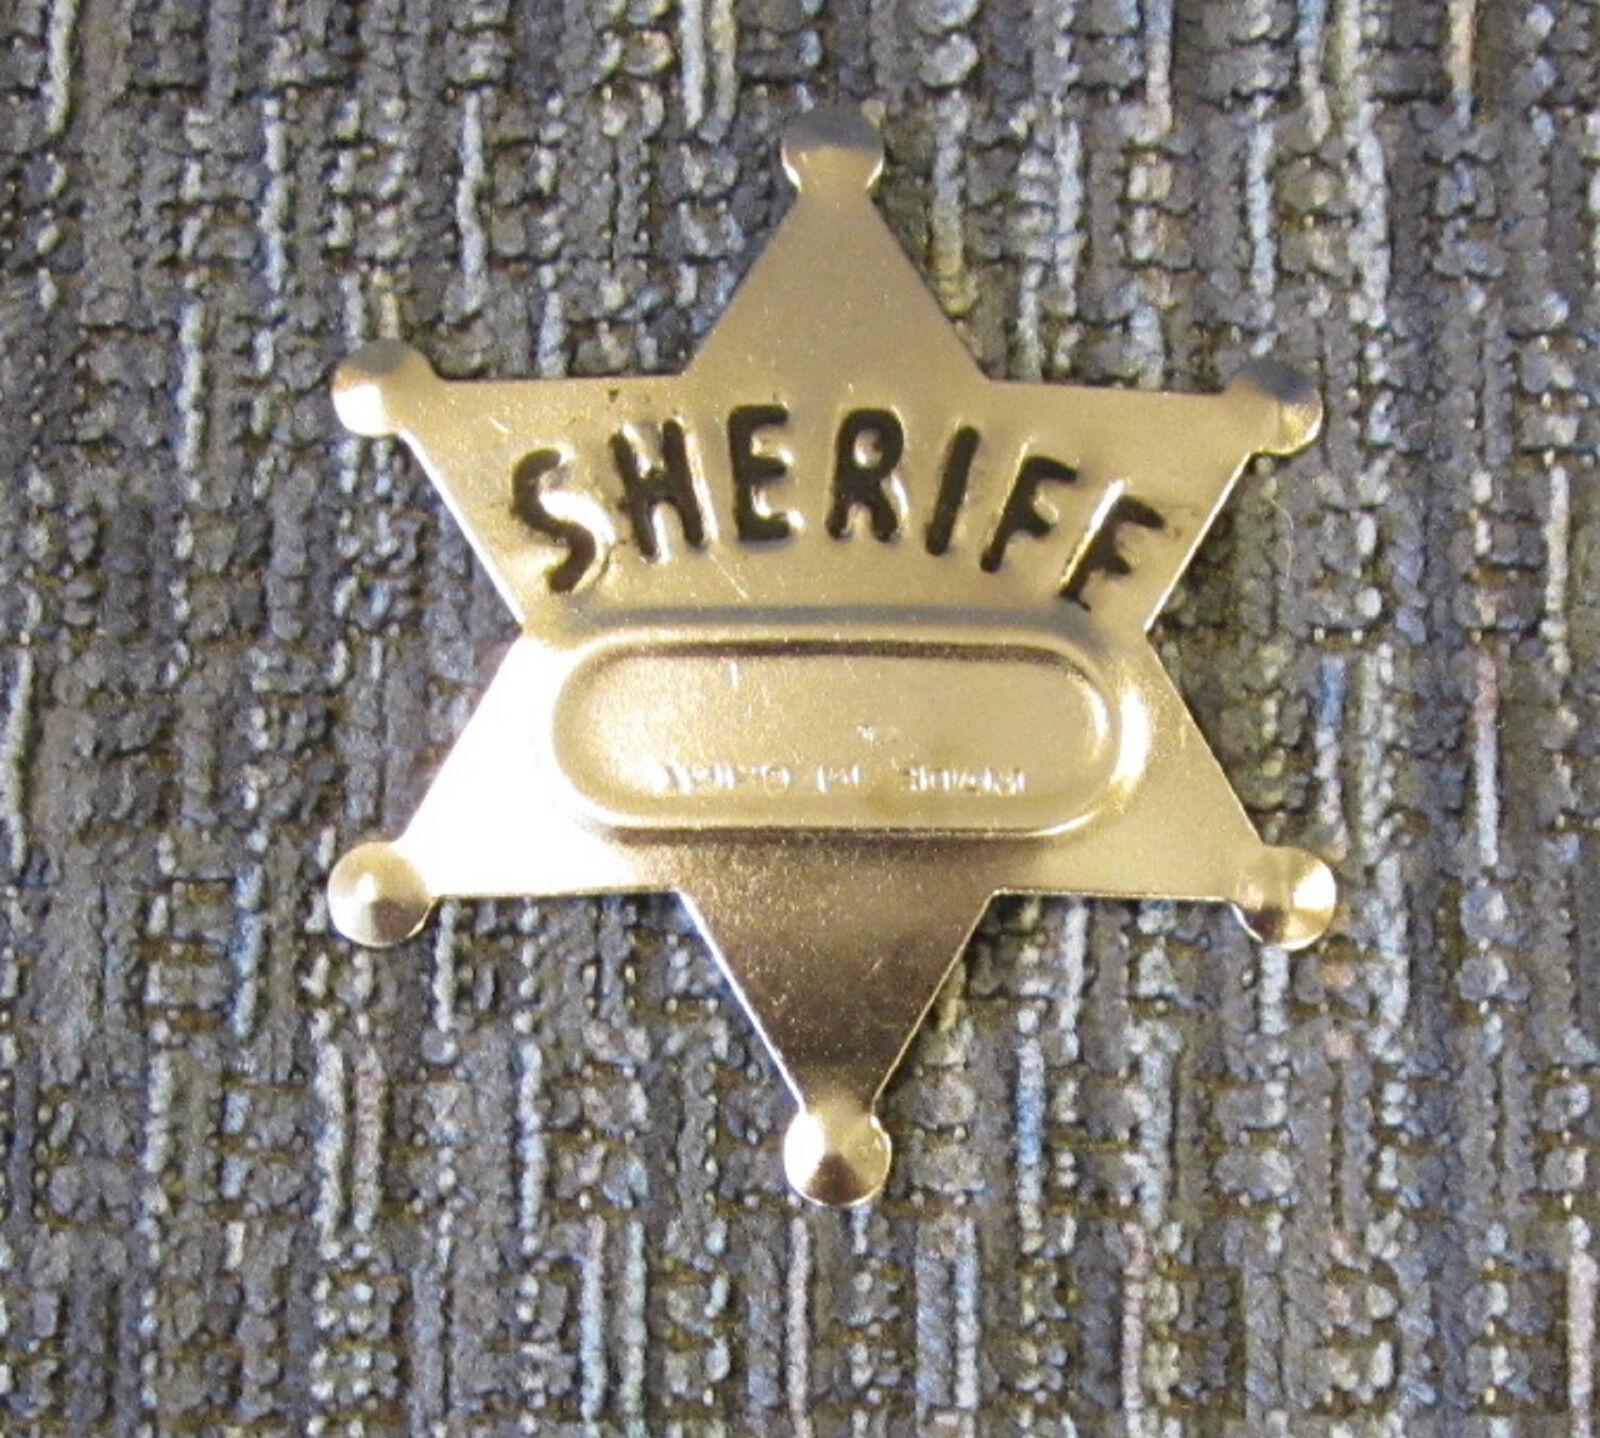 15 Nuevo Metal De Juguete Sheriff Insignias Oeste Cowboy Plata Sheriff Insignia Cotillón